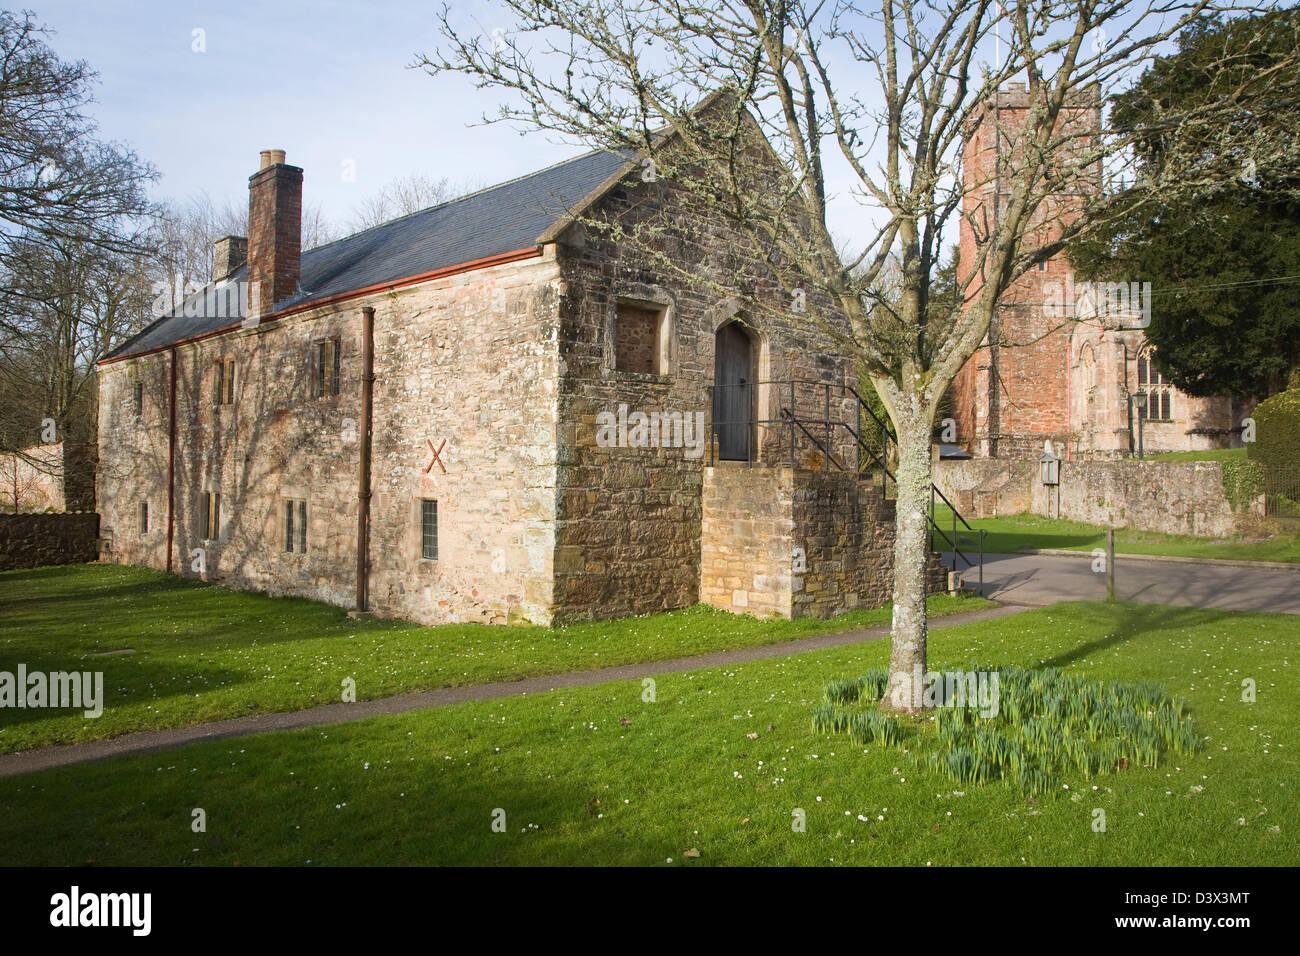 Sixteenth century church house building, Crowcombe, Somerset, England - Stock Image